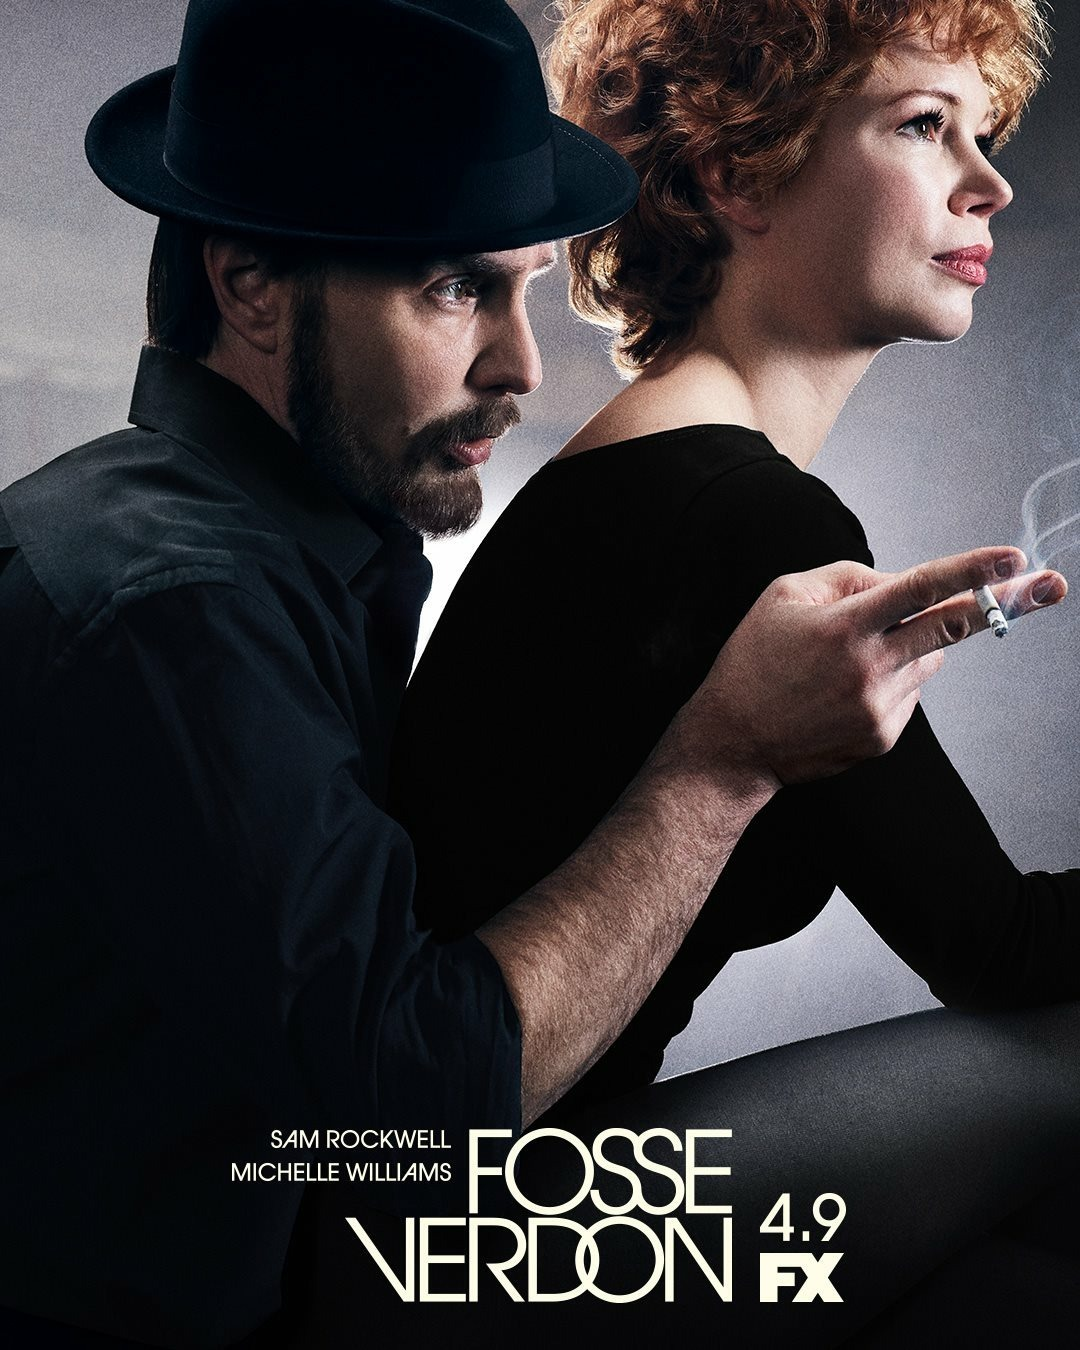 Fosse/Verdon - Thomas Kail, Steven Levenson